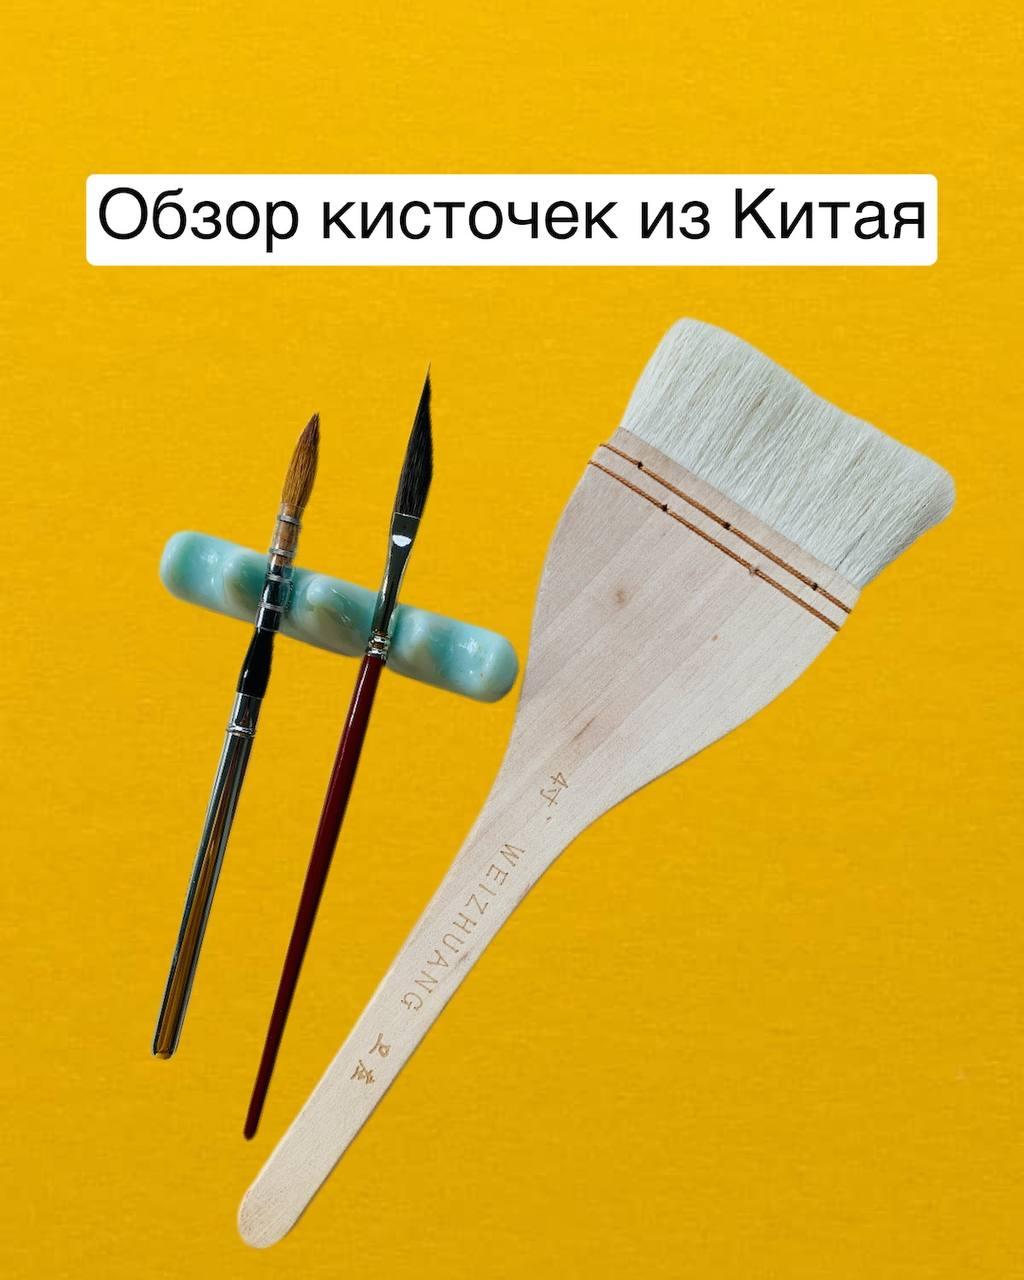 space364-hydojestvennue material-aliexpress-bumaga-akvarel-kistochki-bloknot